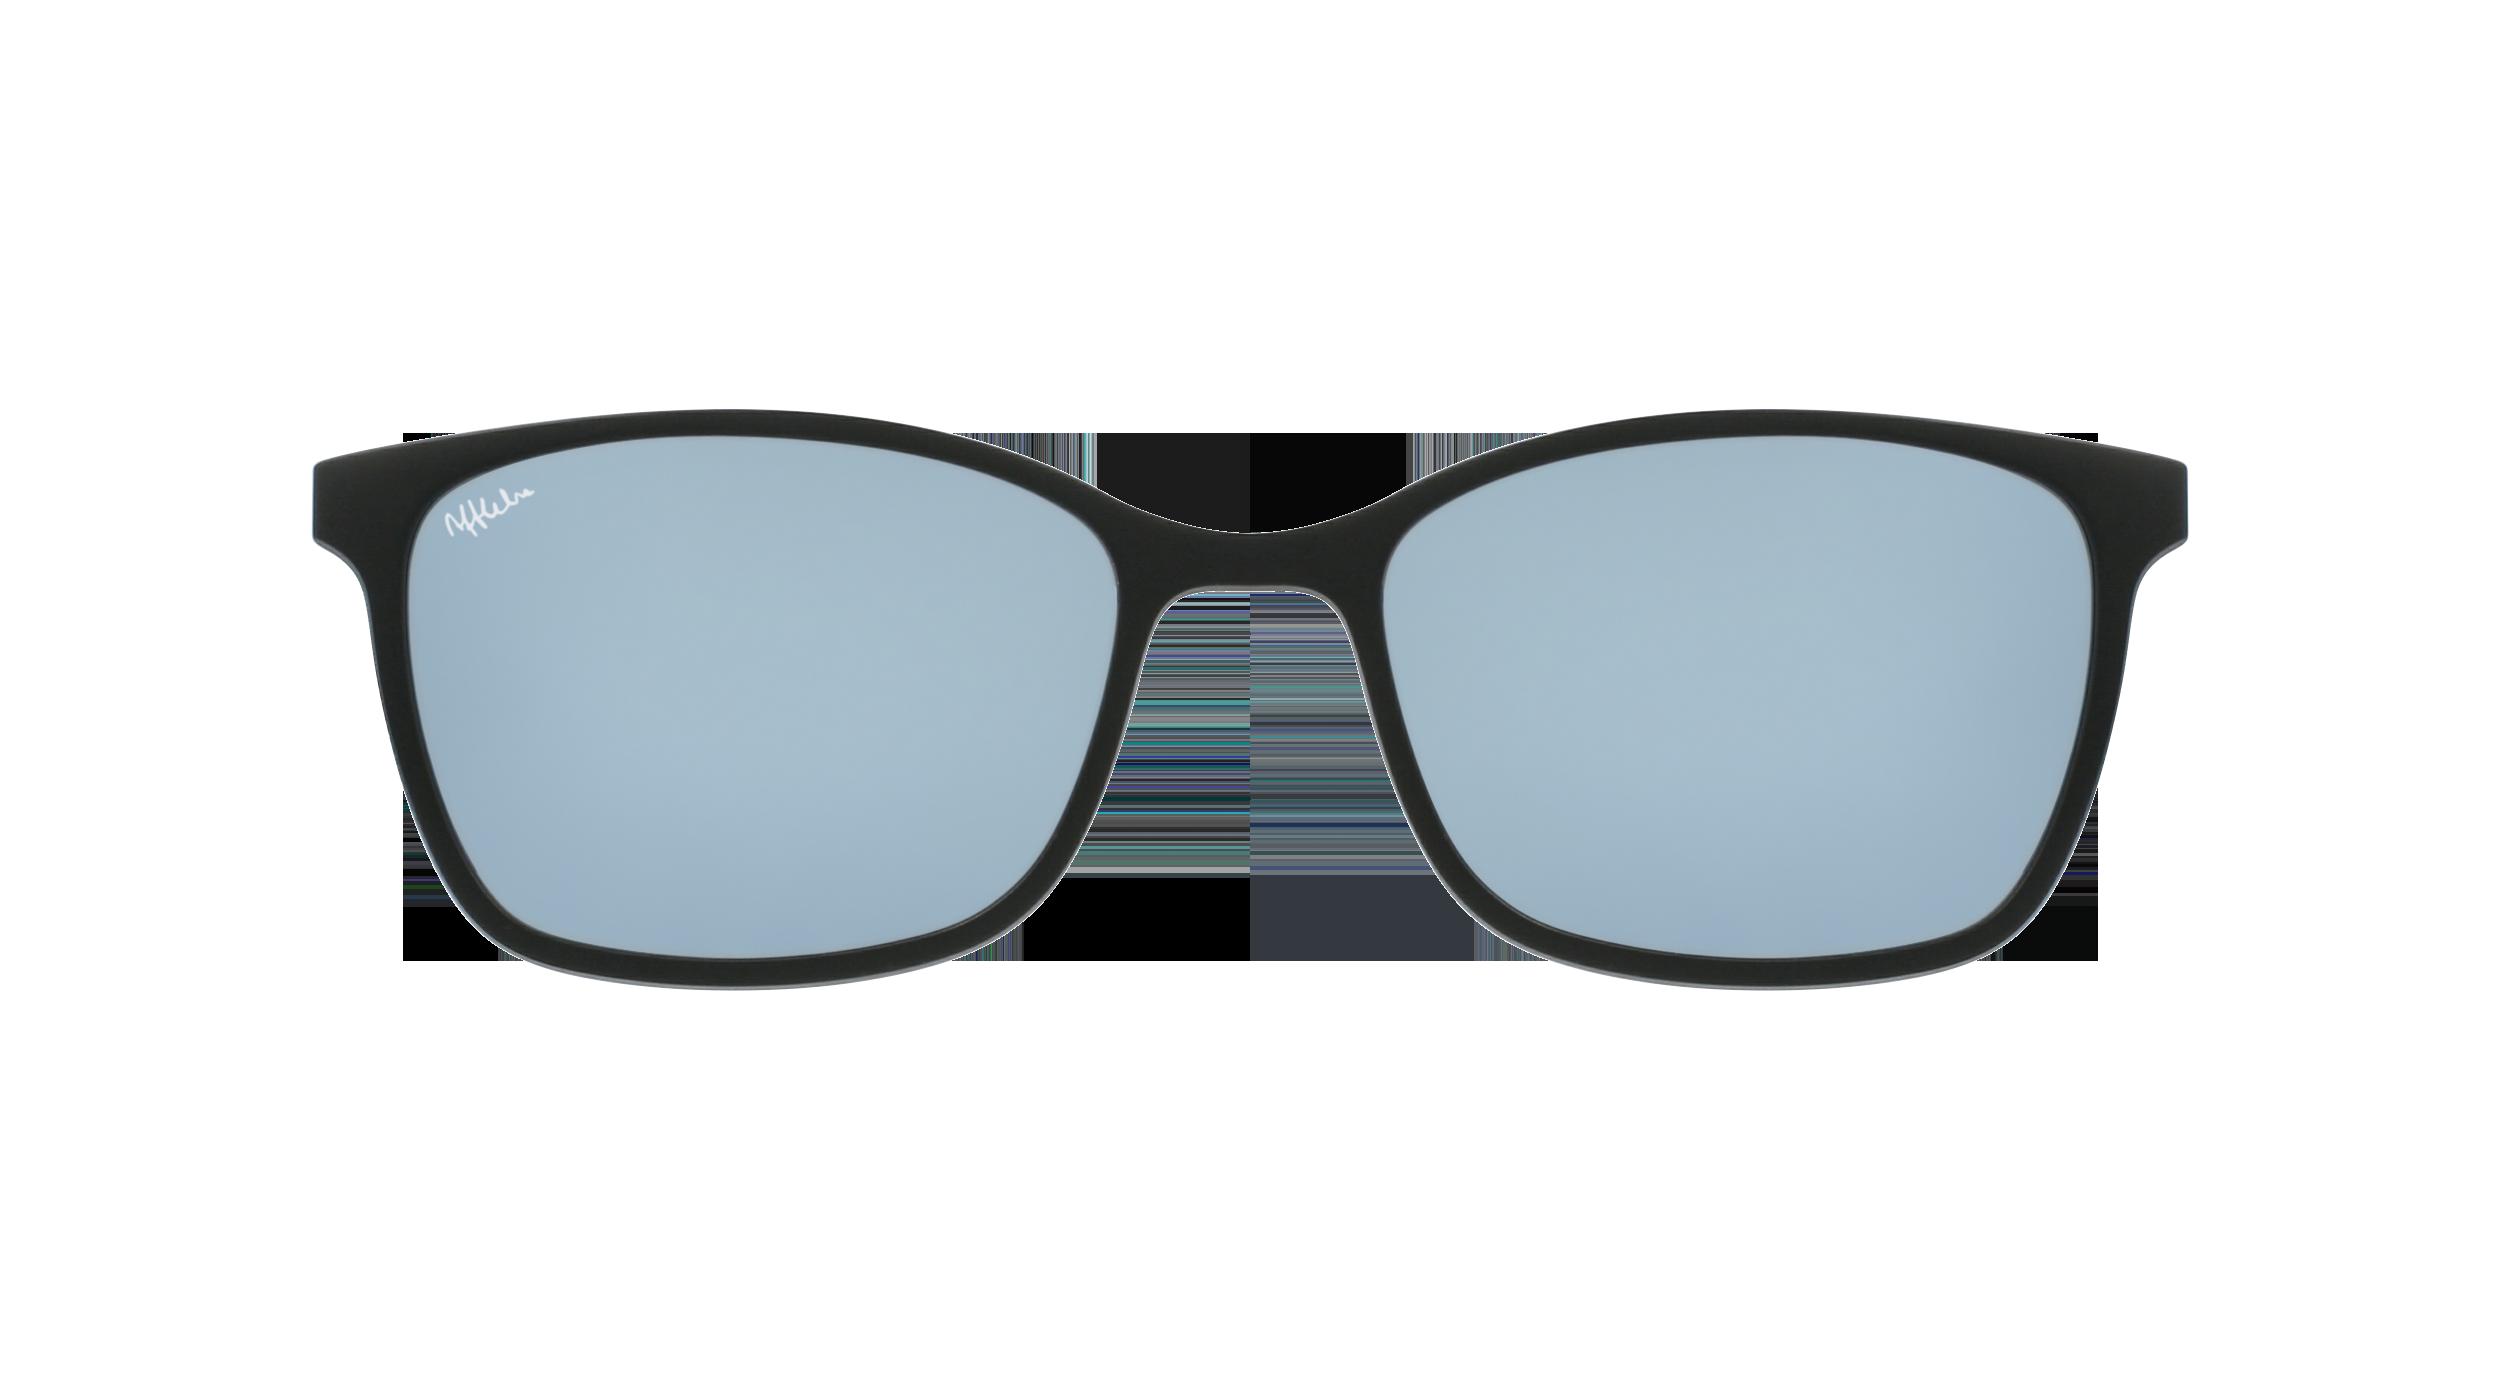 afflelou/france/products/smart_clip/clips_glasses/07630036459027.png